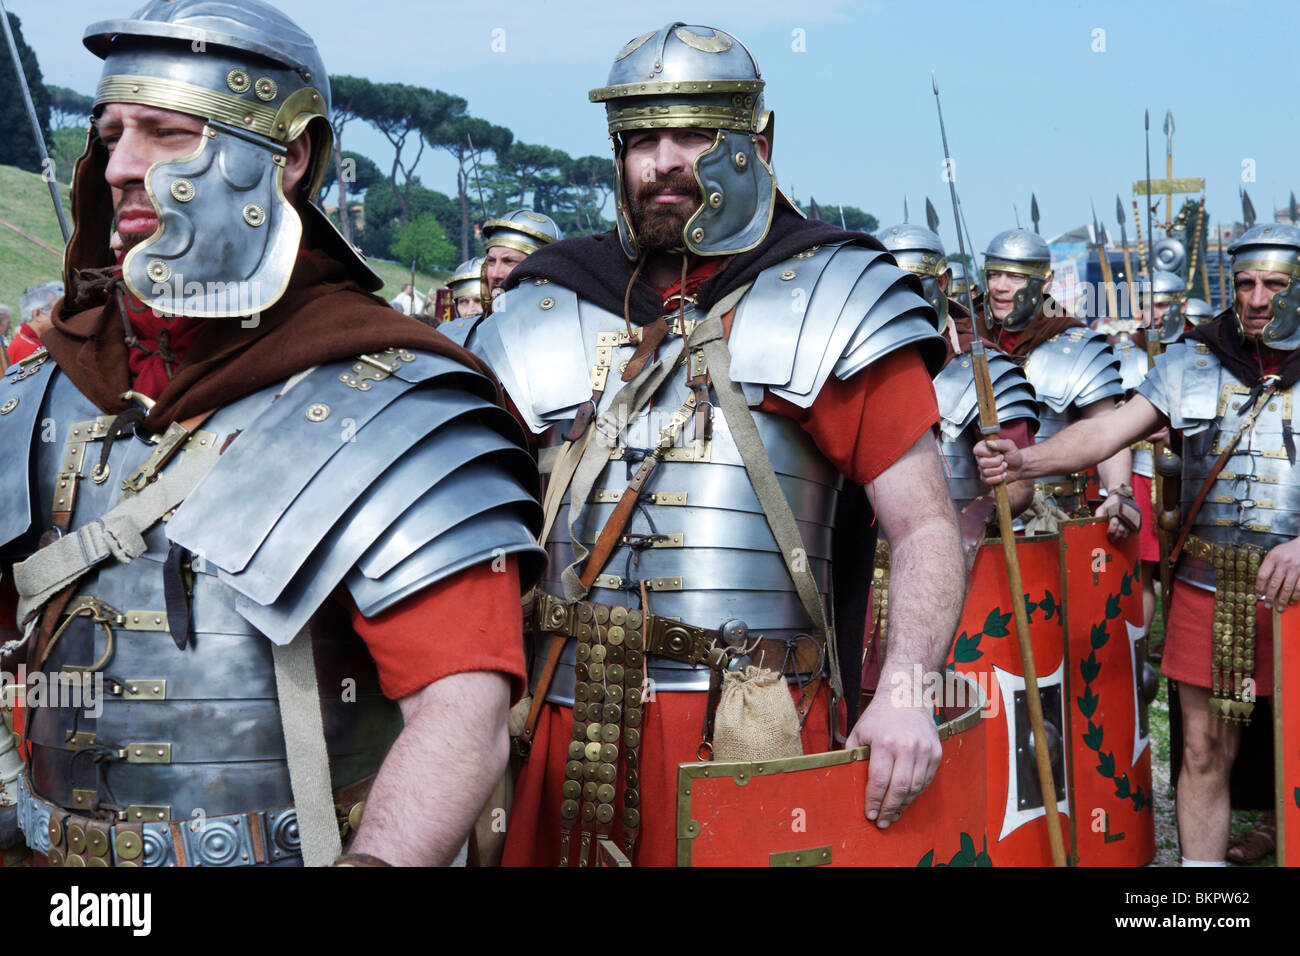 Legionary Roman Soldier History Roman Re Enactors Festival 2010